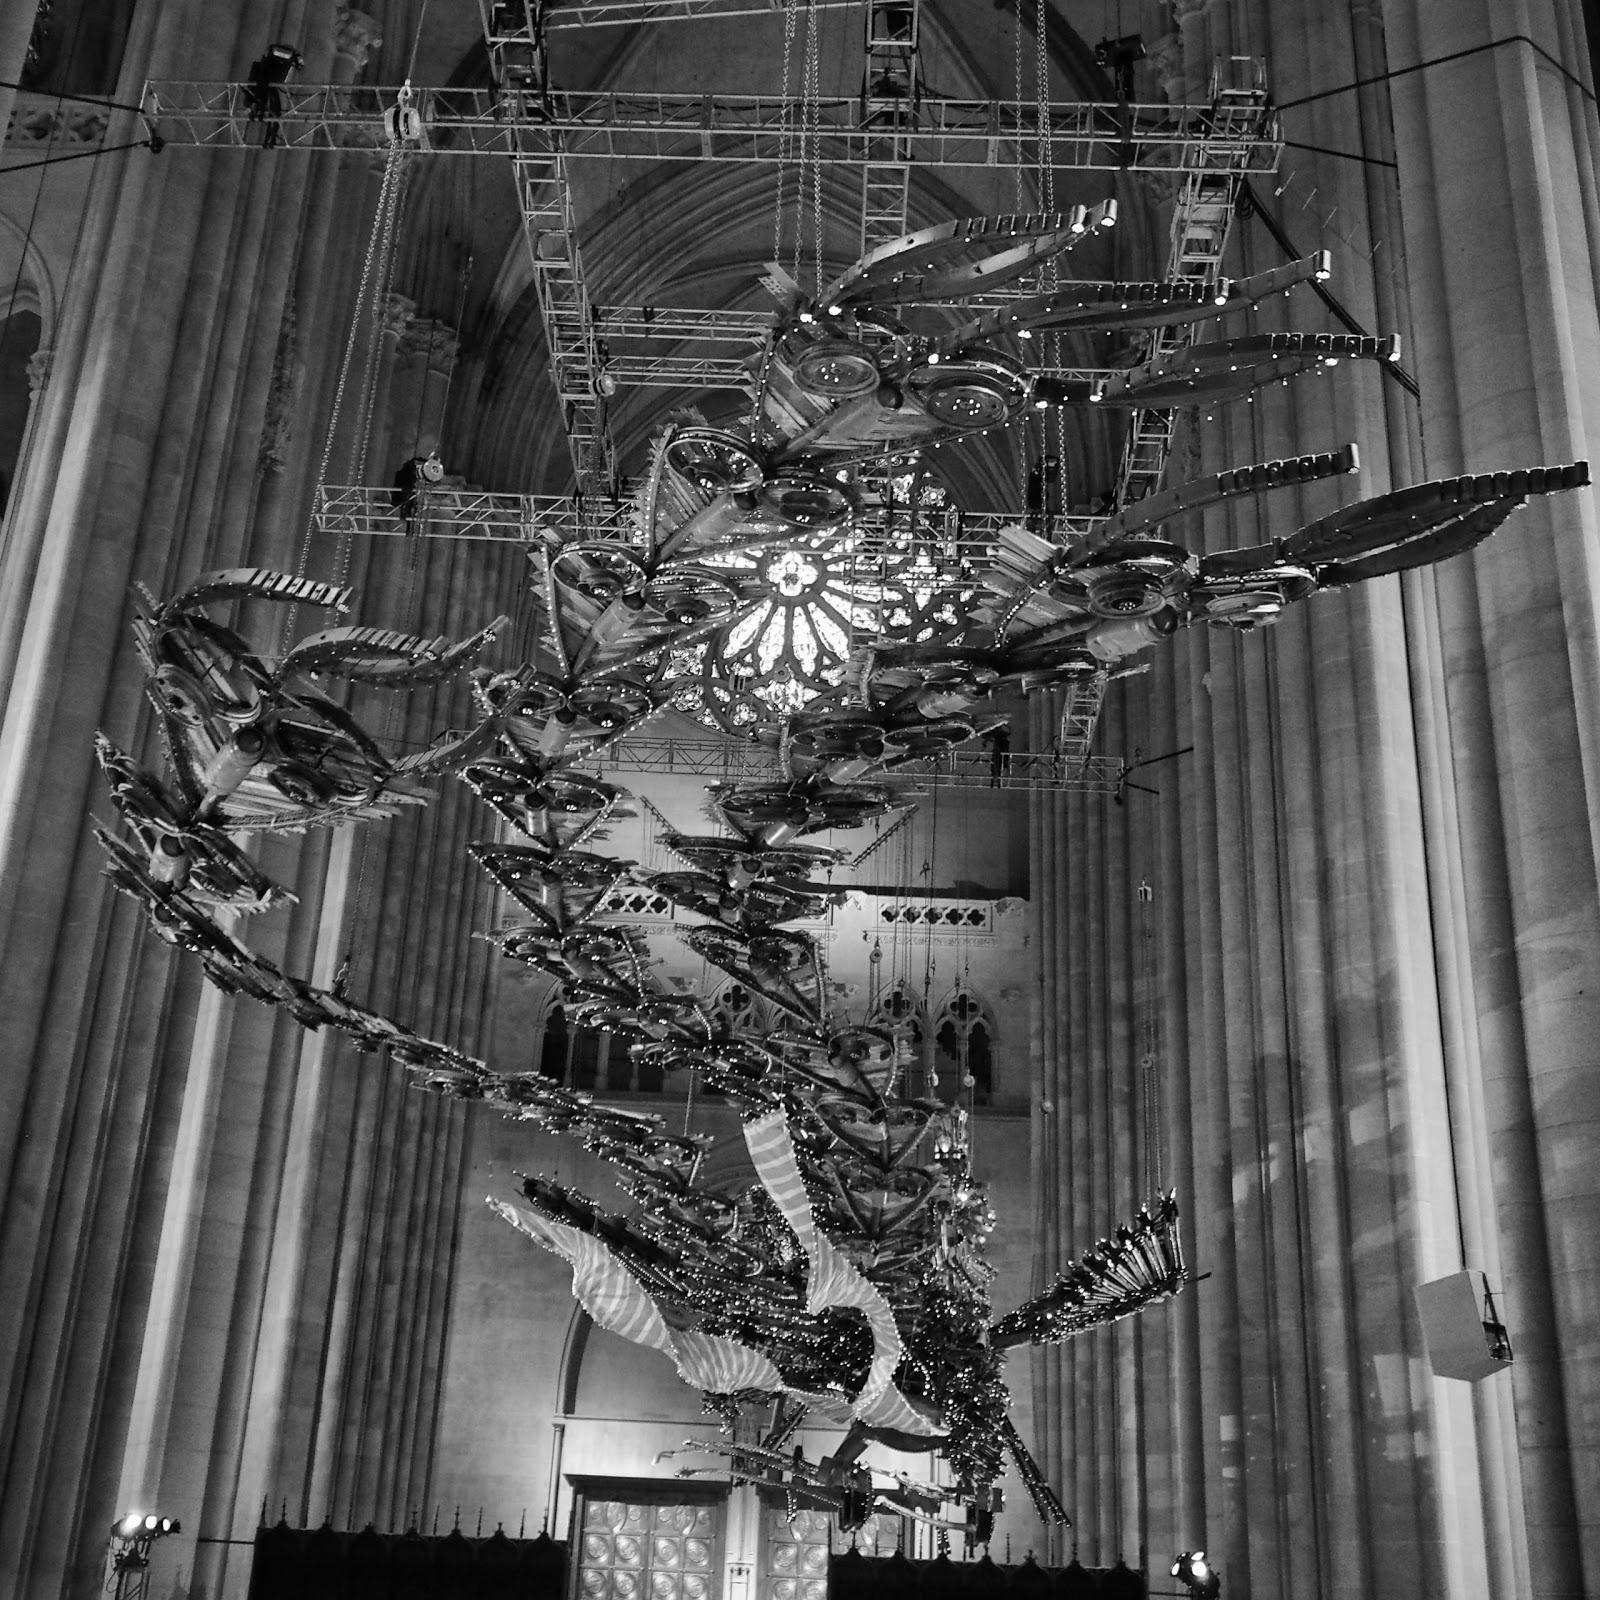 Imagining a Phoenix taking Flight #imaginingaphoenixtakingflight #phoenix #xubing #stjohnthedivinecathedral #art #nyc ©2014 Nancy Lundebjerg